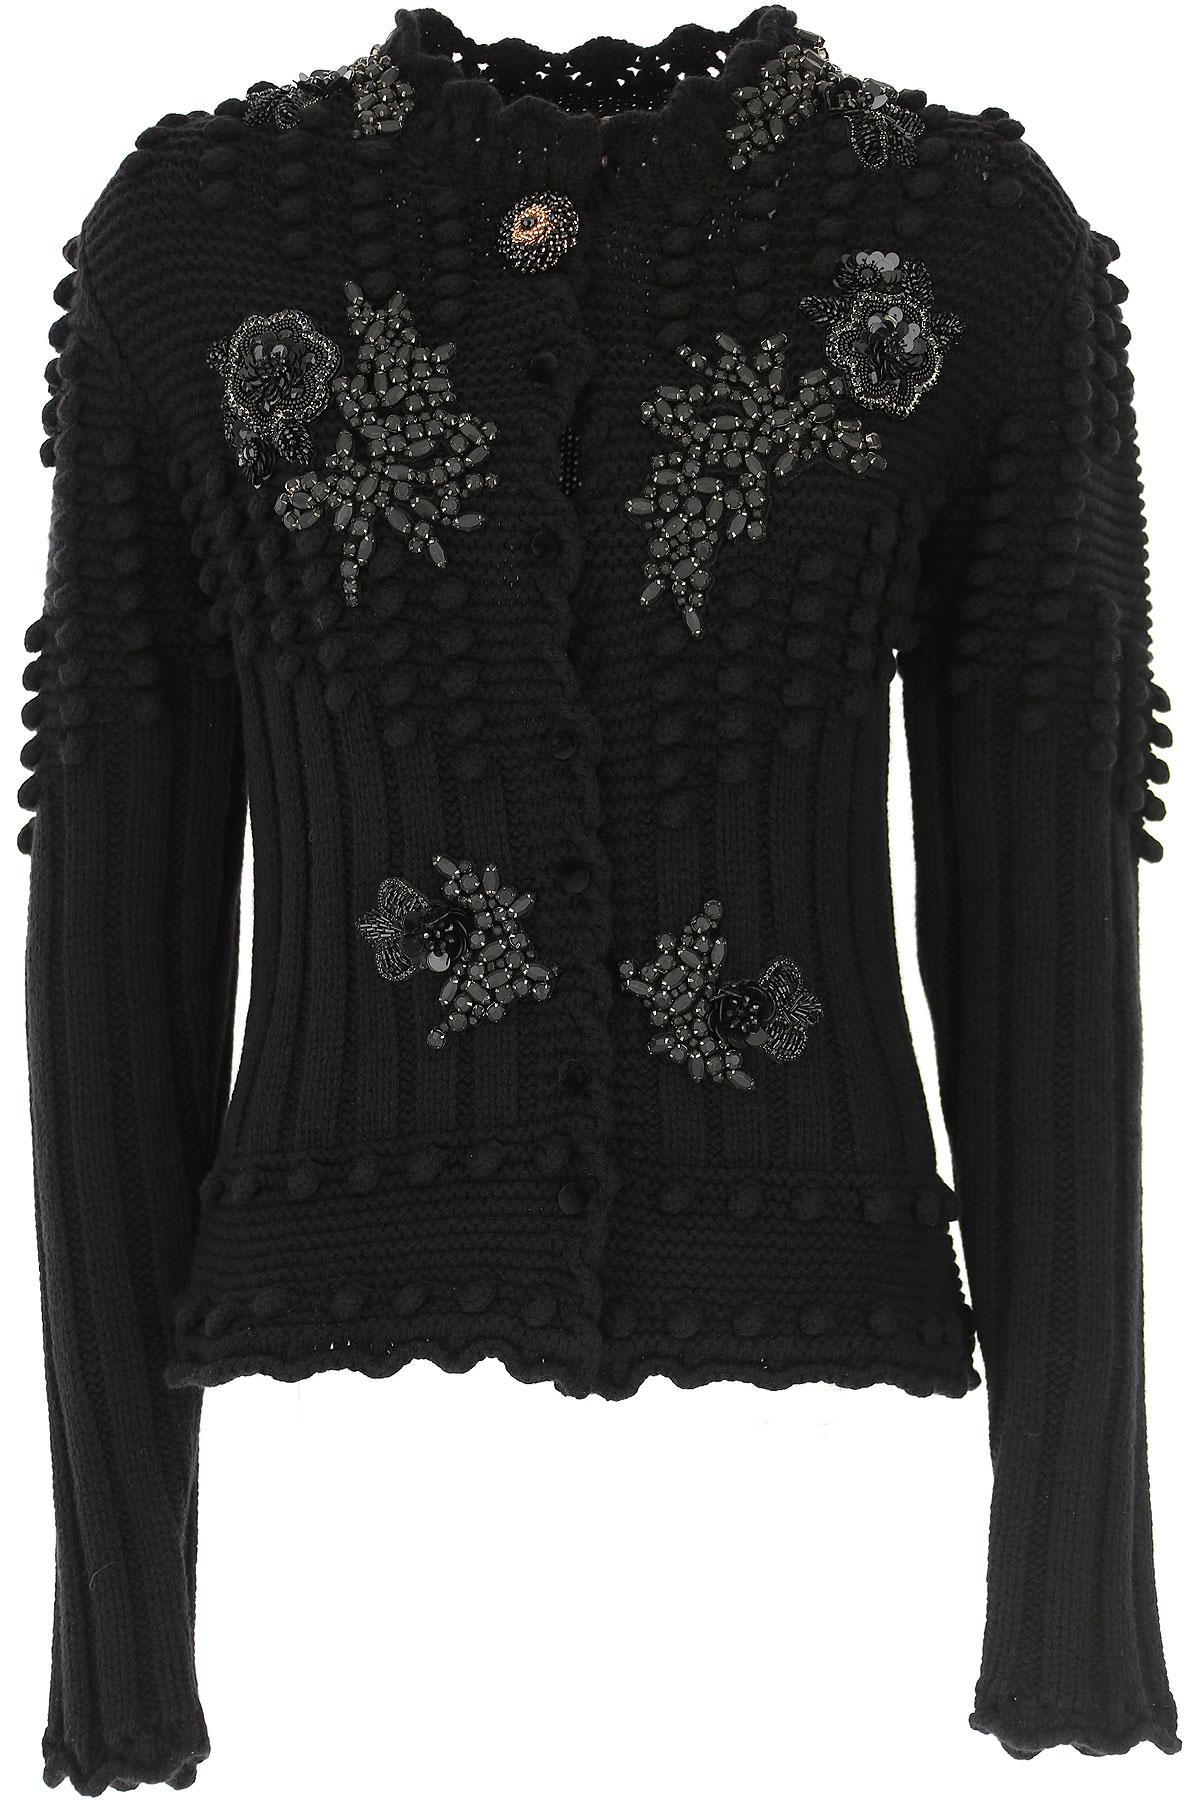 Image of Antonio Marras Sweater for Women Jumper, Black, Virgin wool, 2017, 4 6